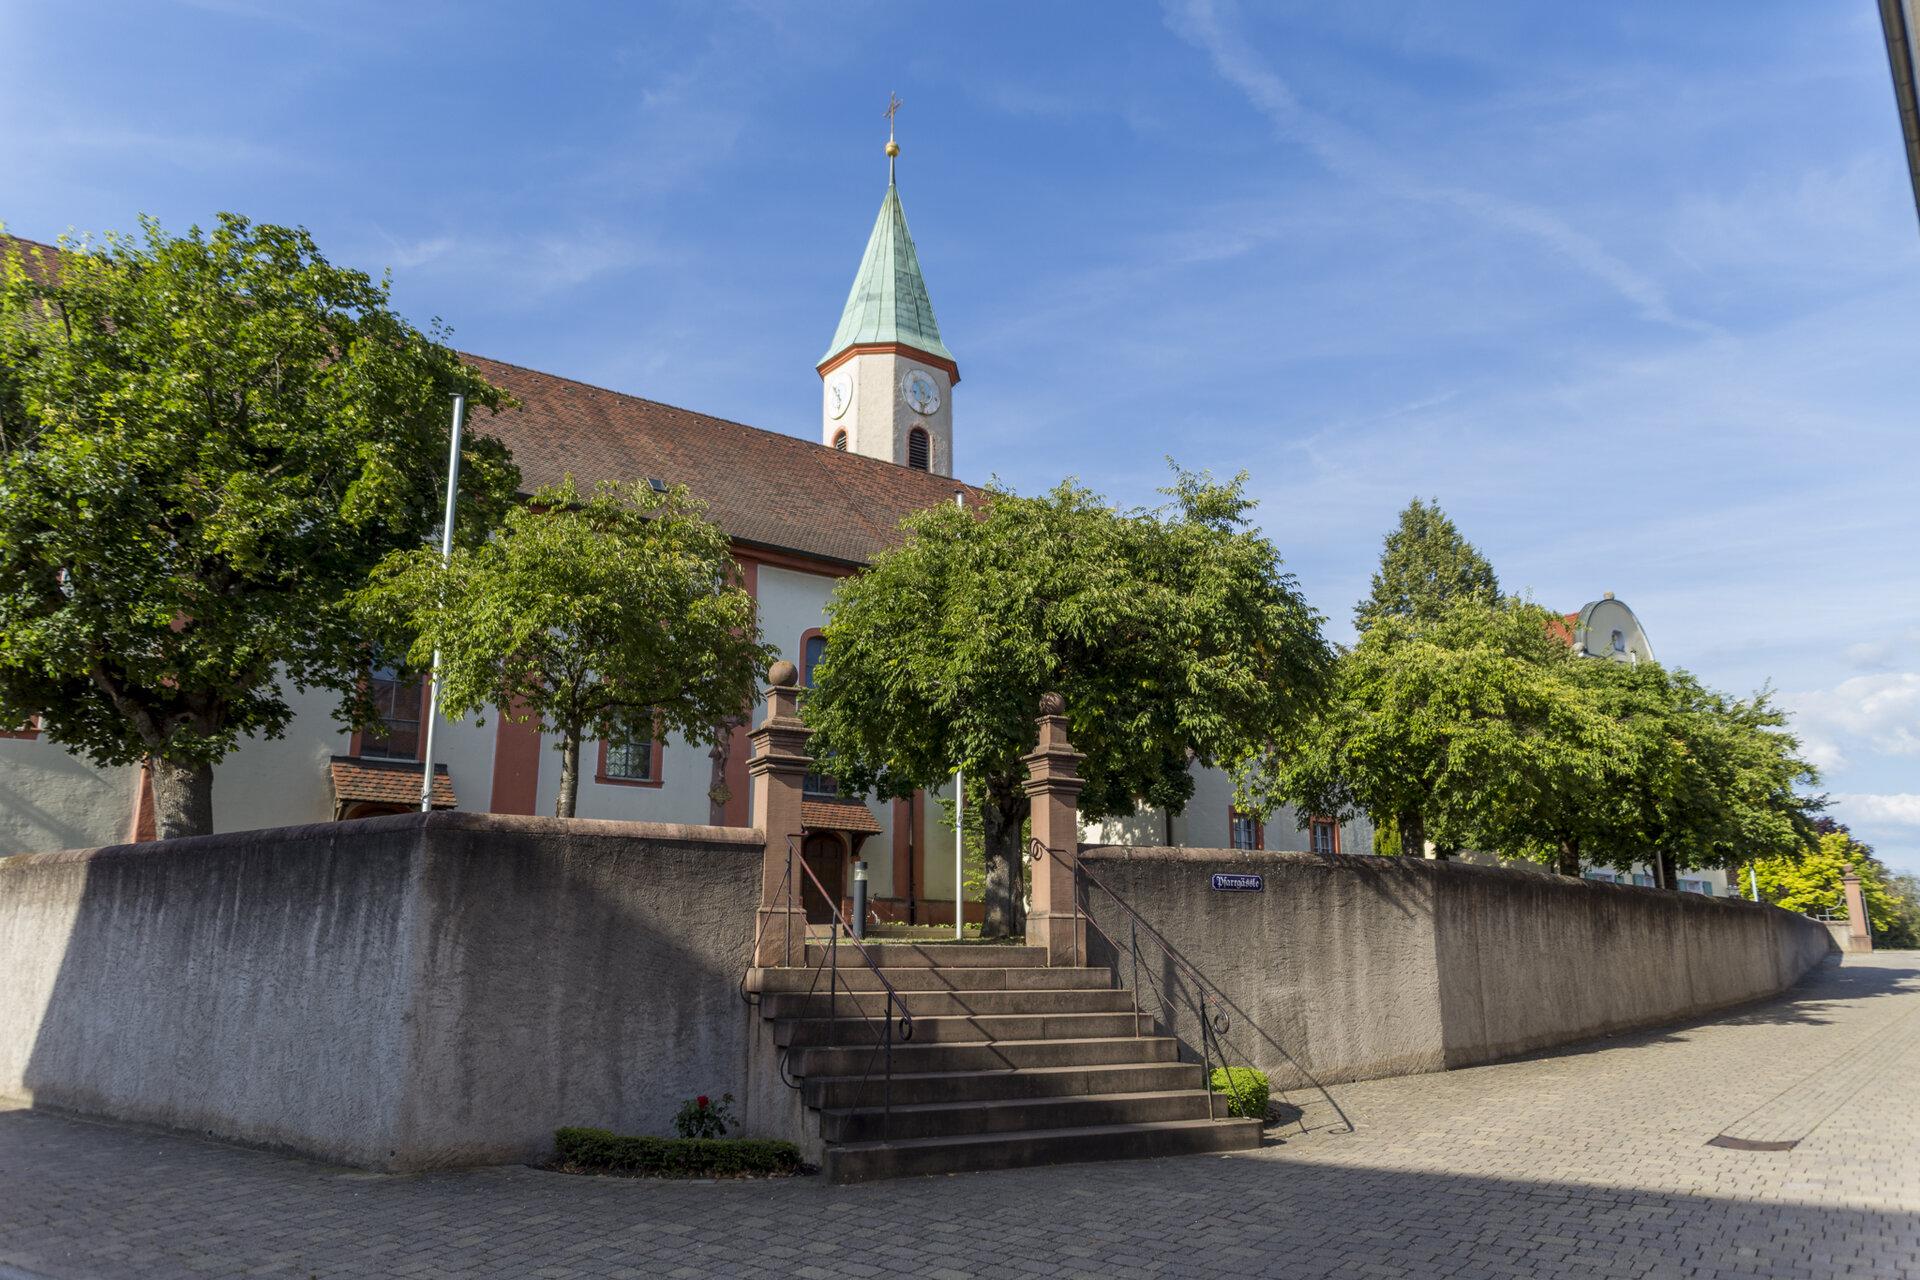 St. Blasius Kirche Wyhl